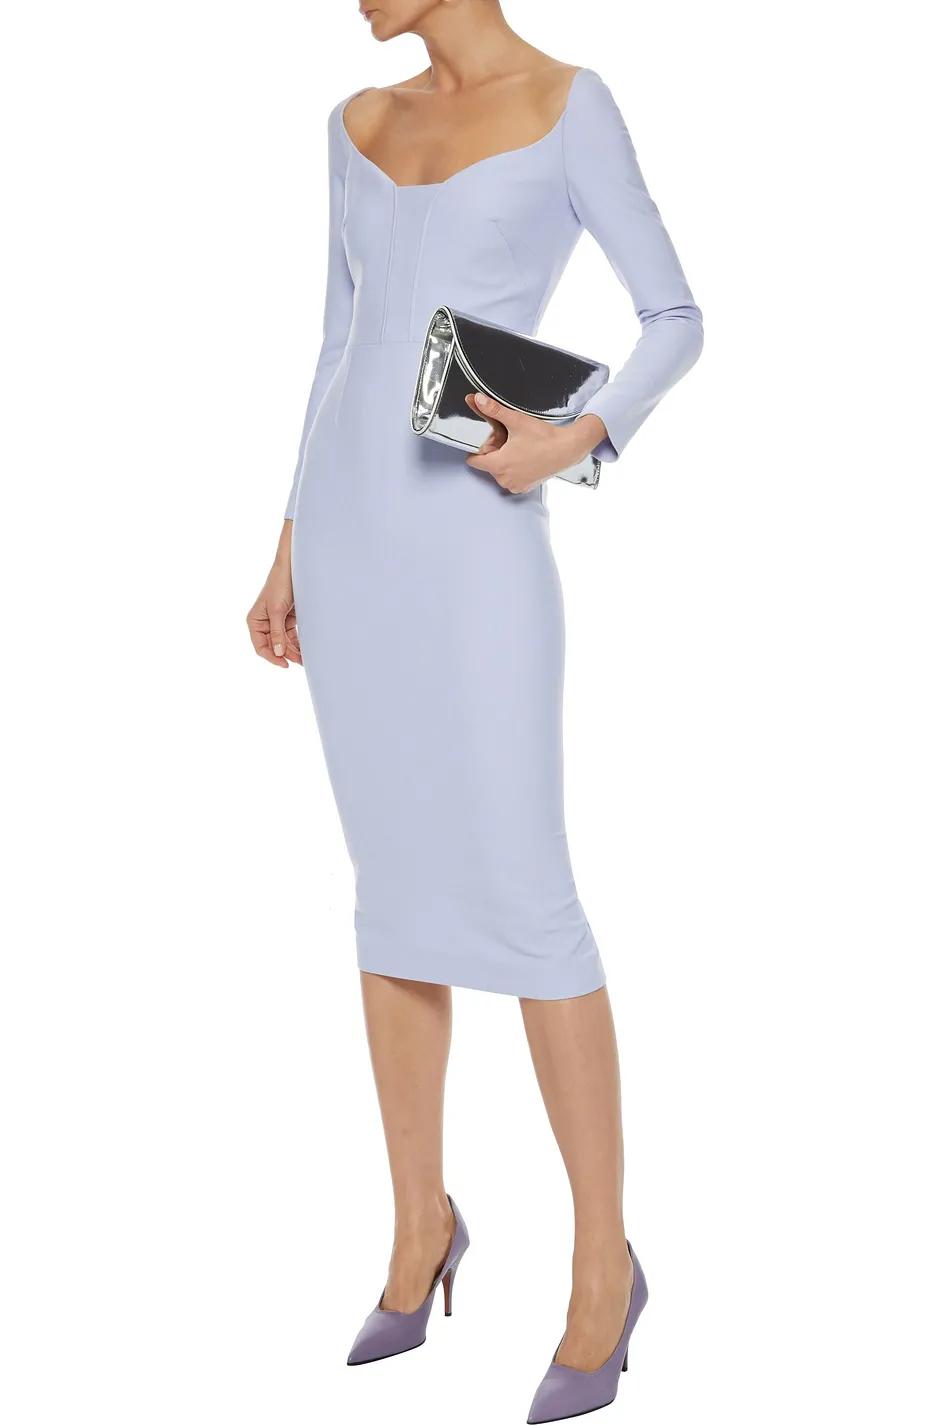 Lilac Ardon Stretch Crepe Midi Dress Sale Up To 70 Off The Outnet Roland Mouret Roland Mouret Dress Fashion Midi Dress Sale [ 1425 x 950 Pixel ]